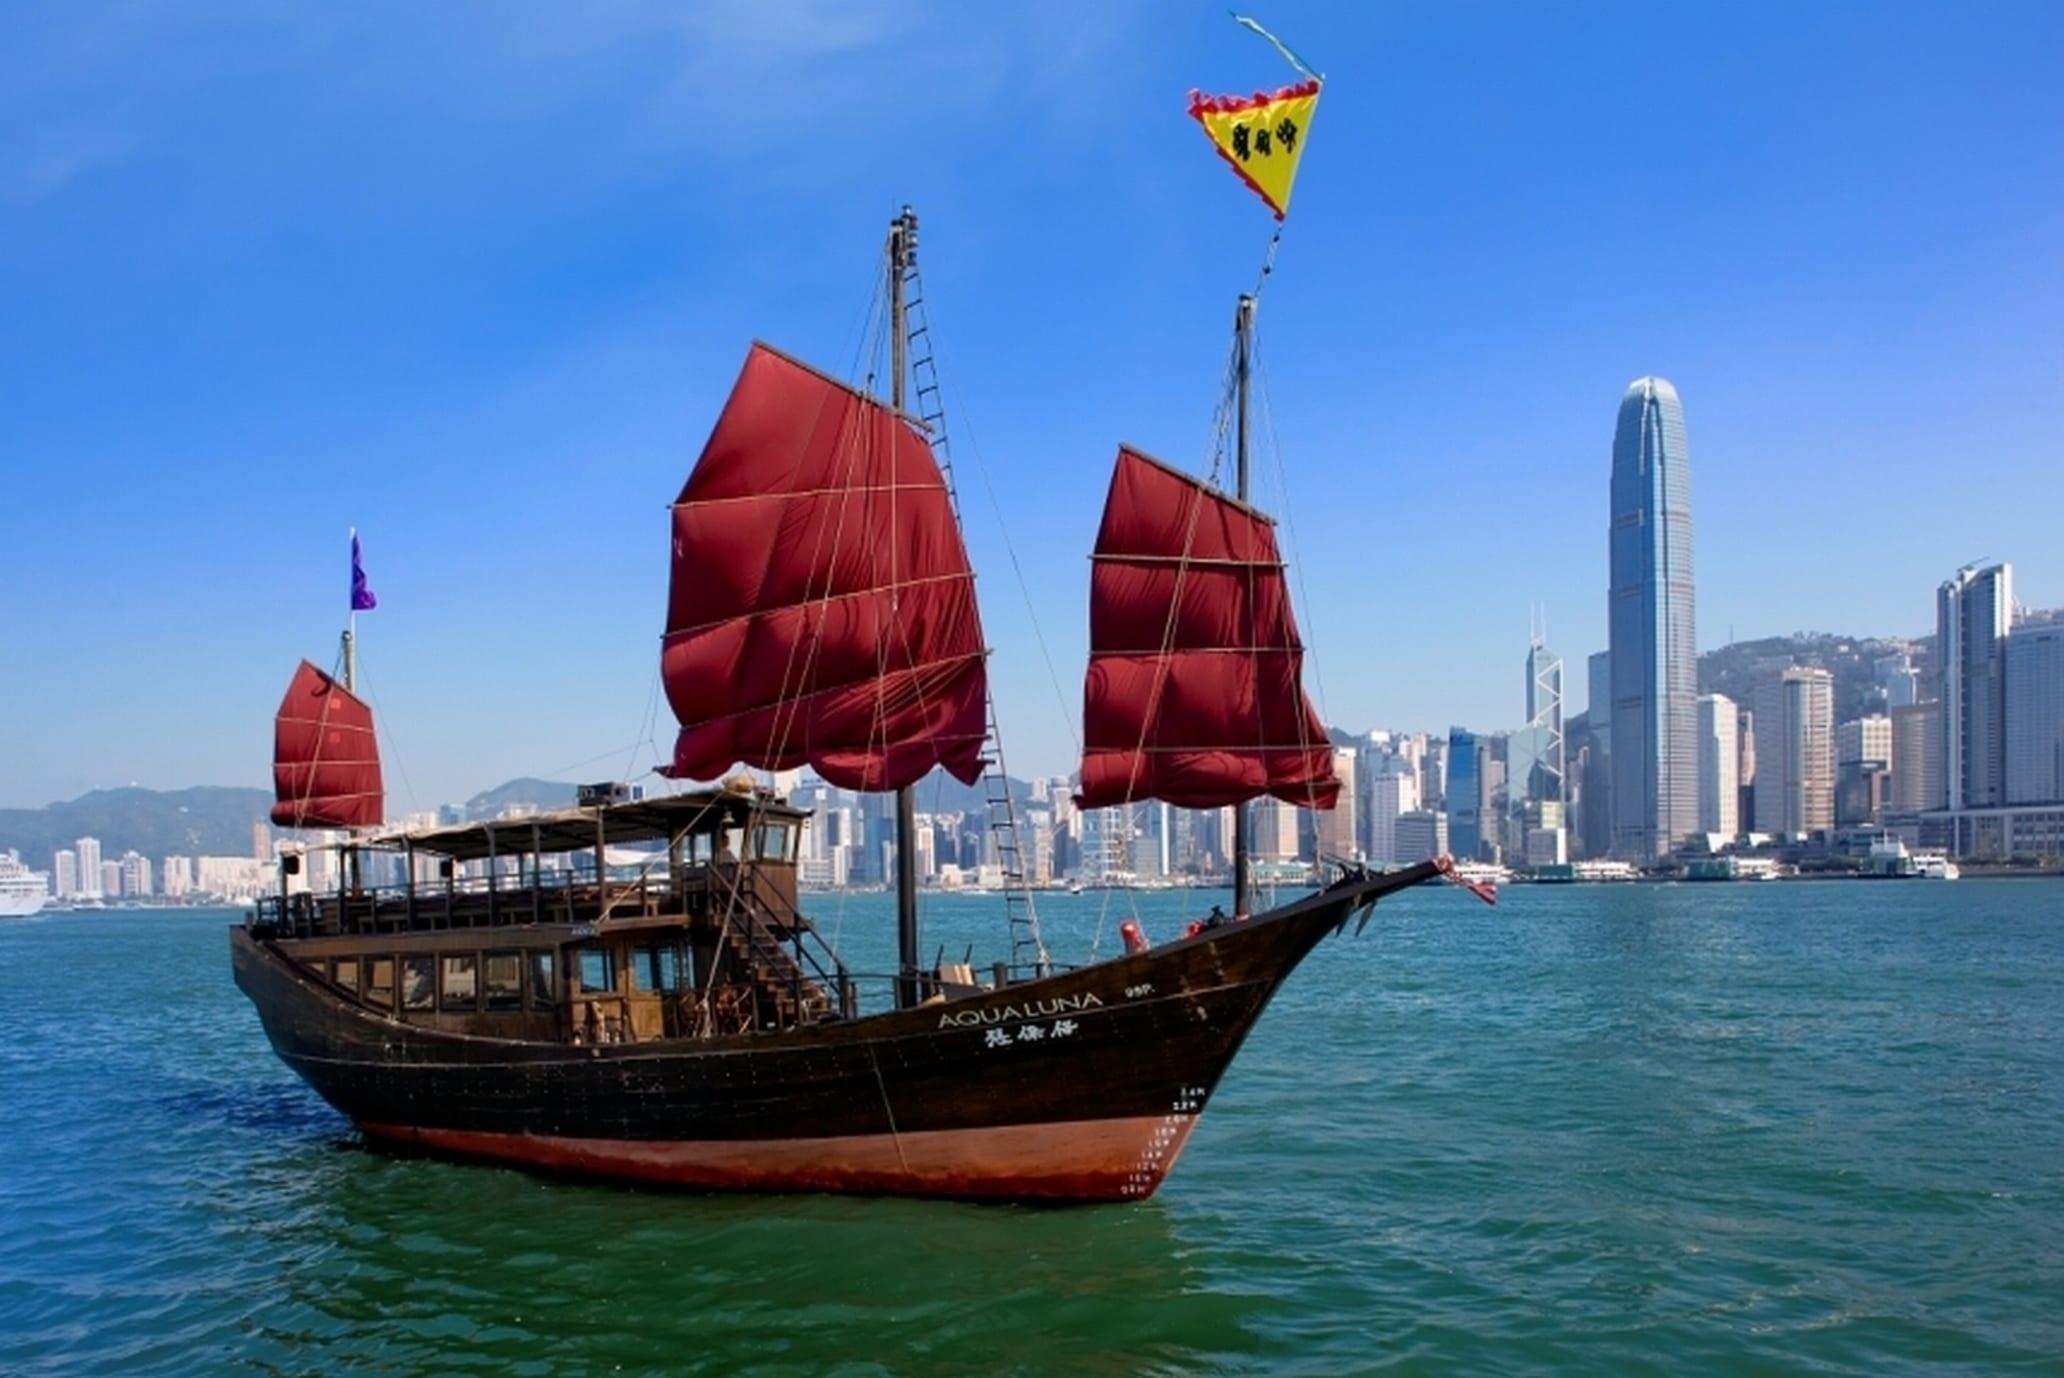 Free sailings on aqualuna